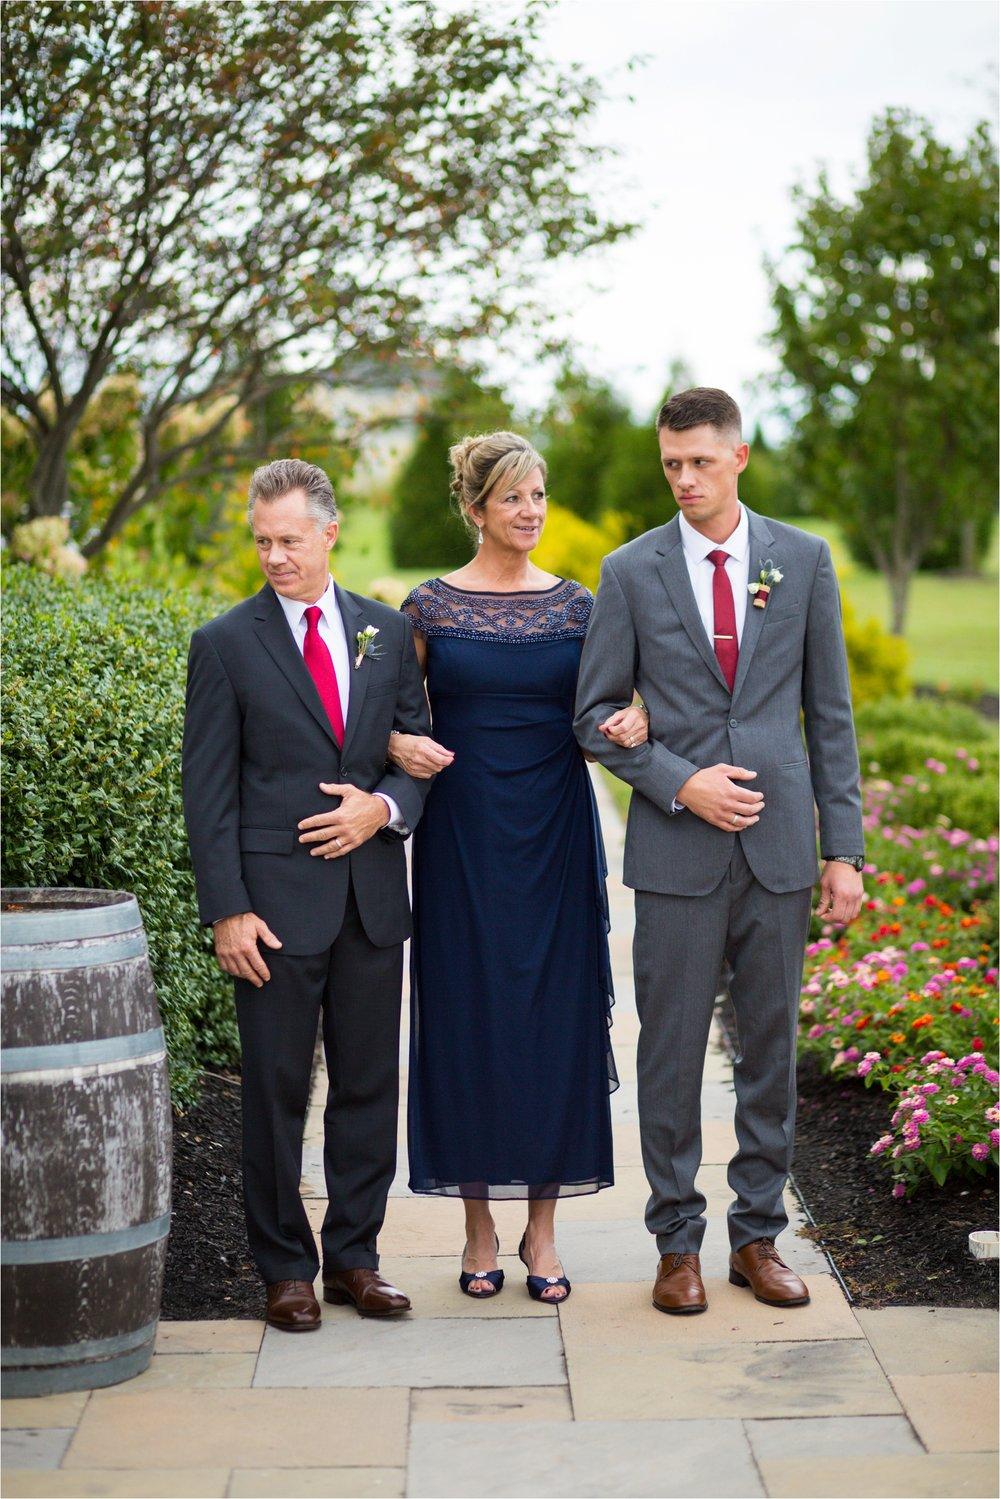 Feather-and-Oak-Photography-Cross-Keys-Vineyard-Wedding-0804.jpg